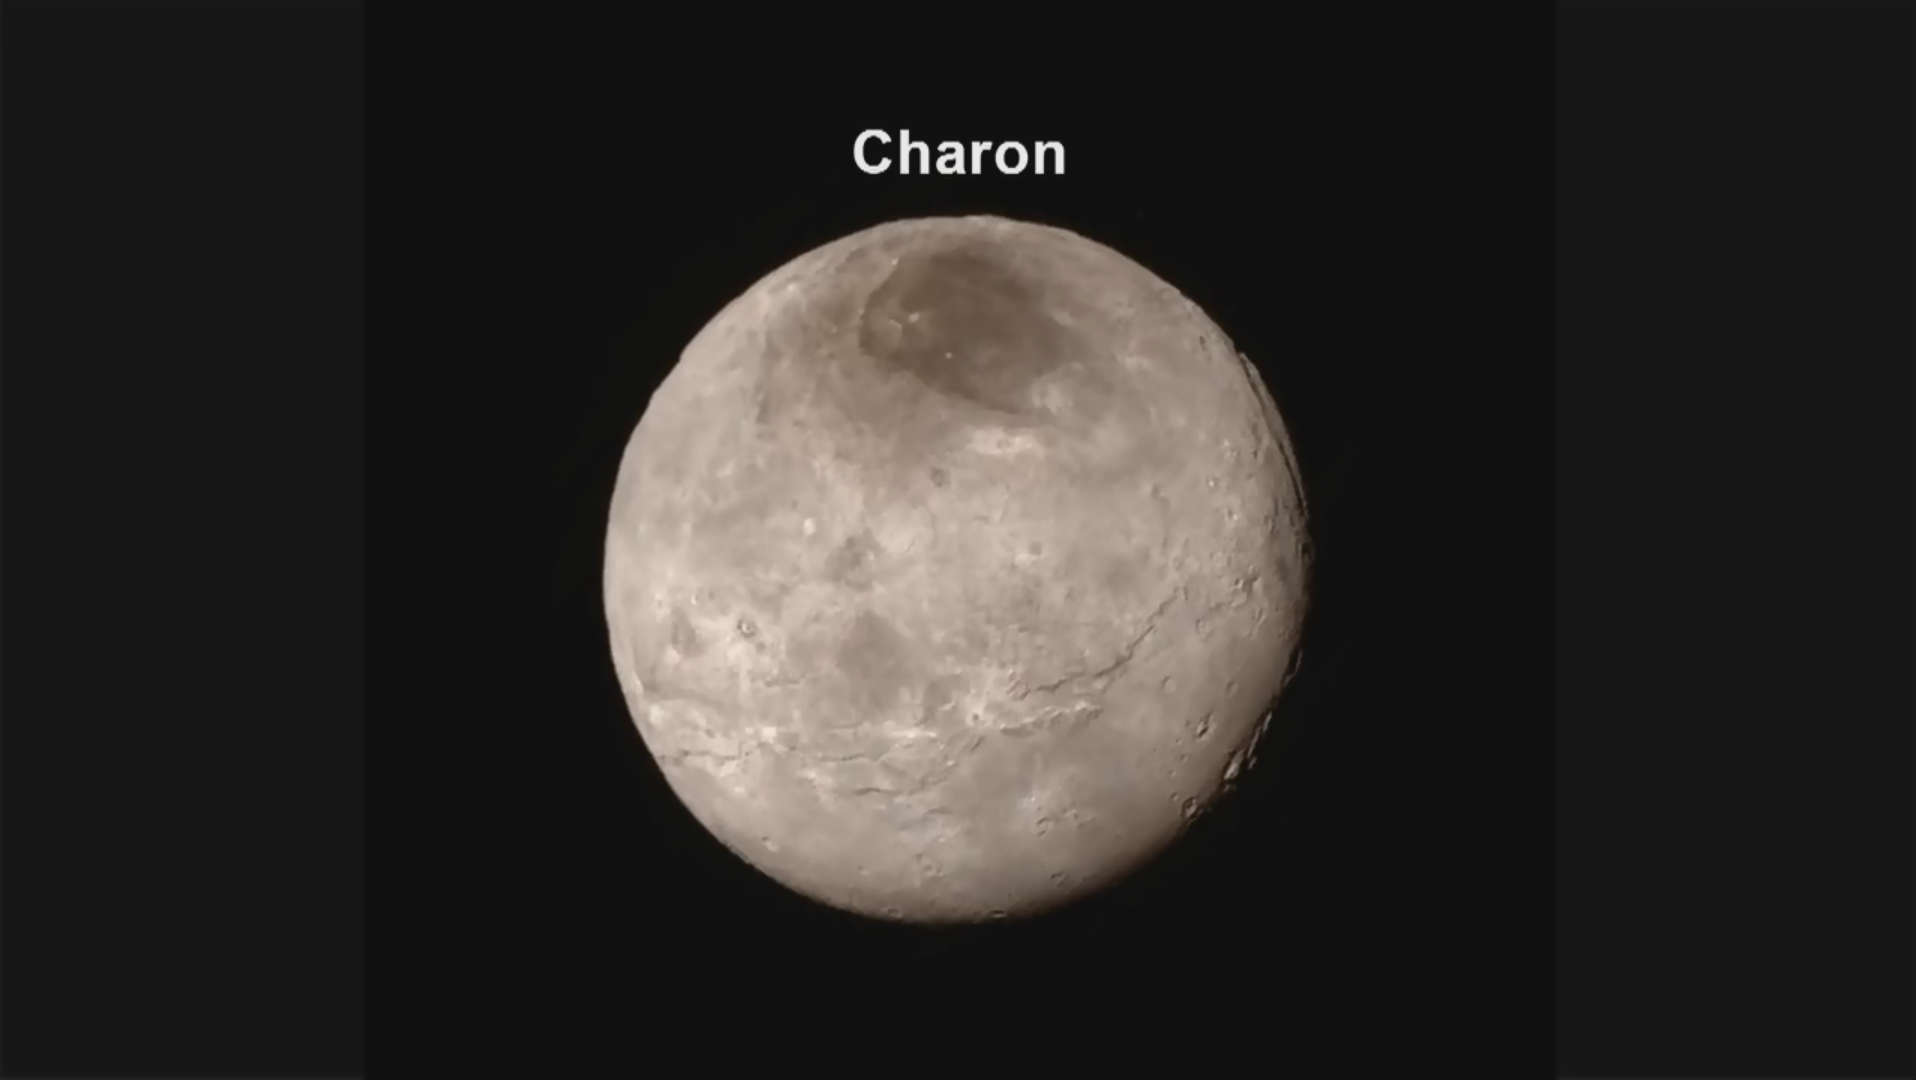 Gallifrey Falls No More – It's On Charon